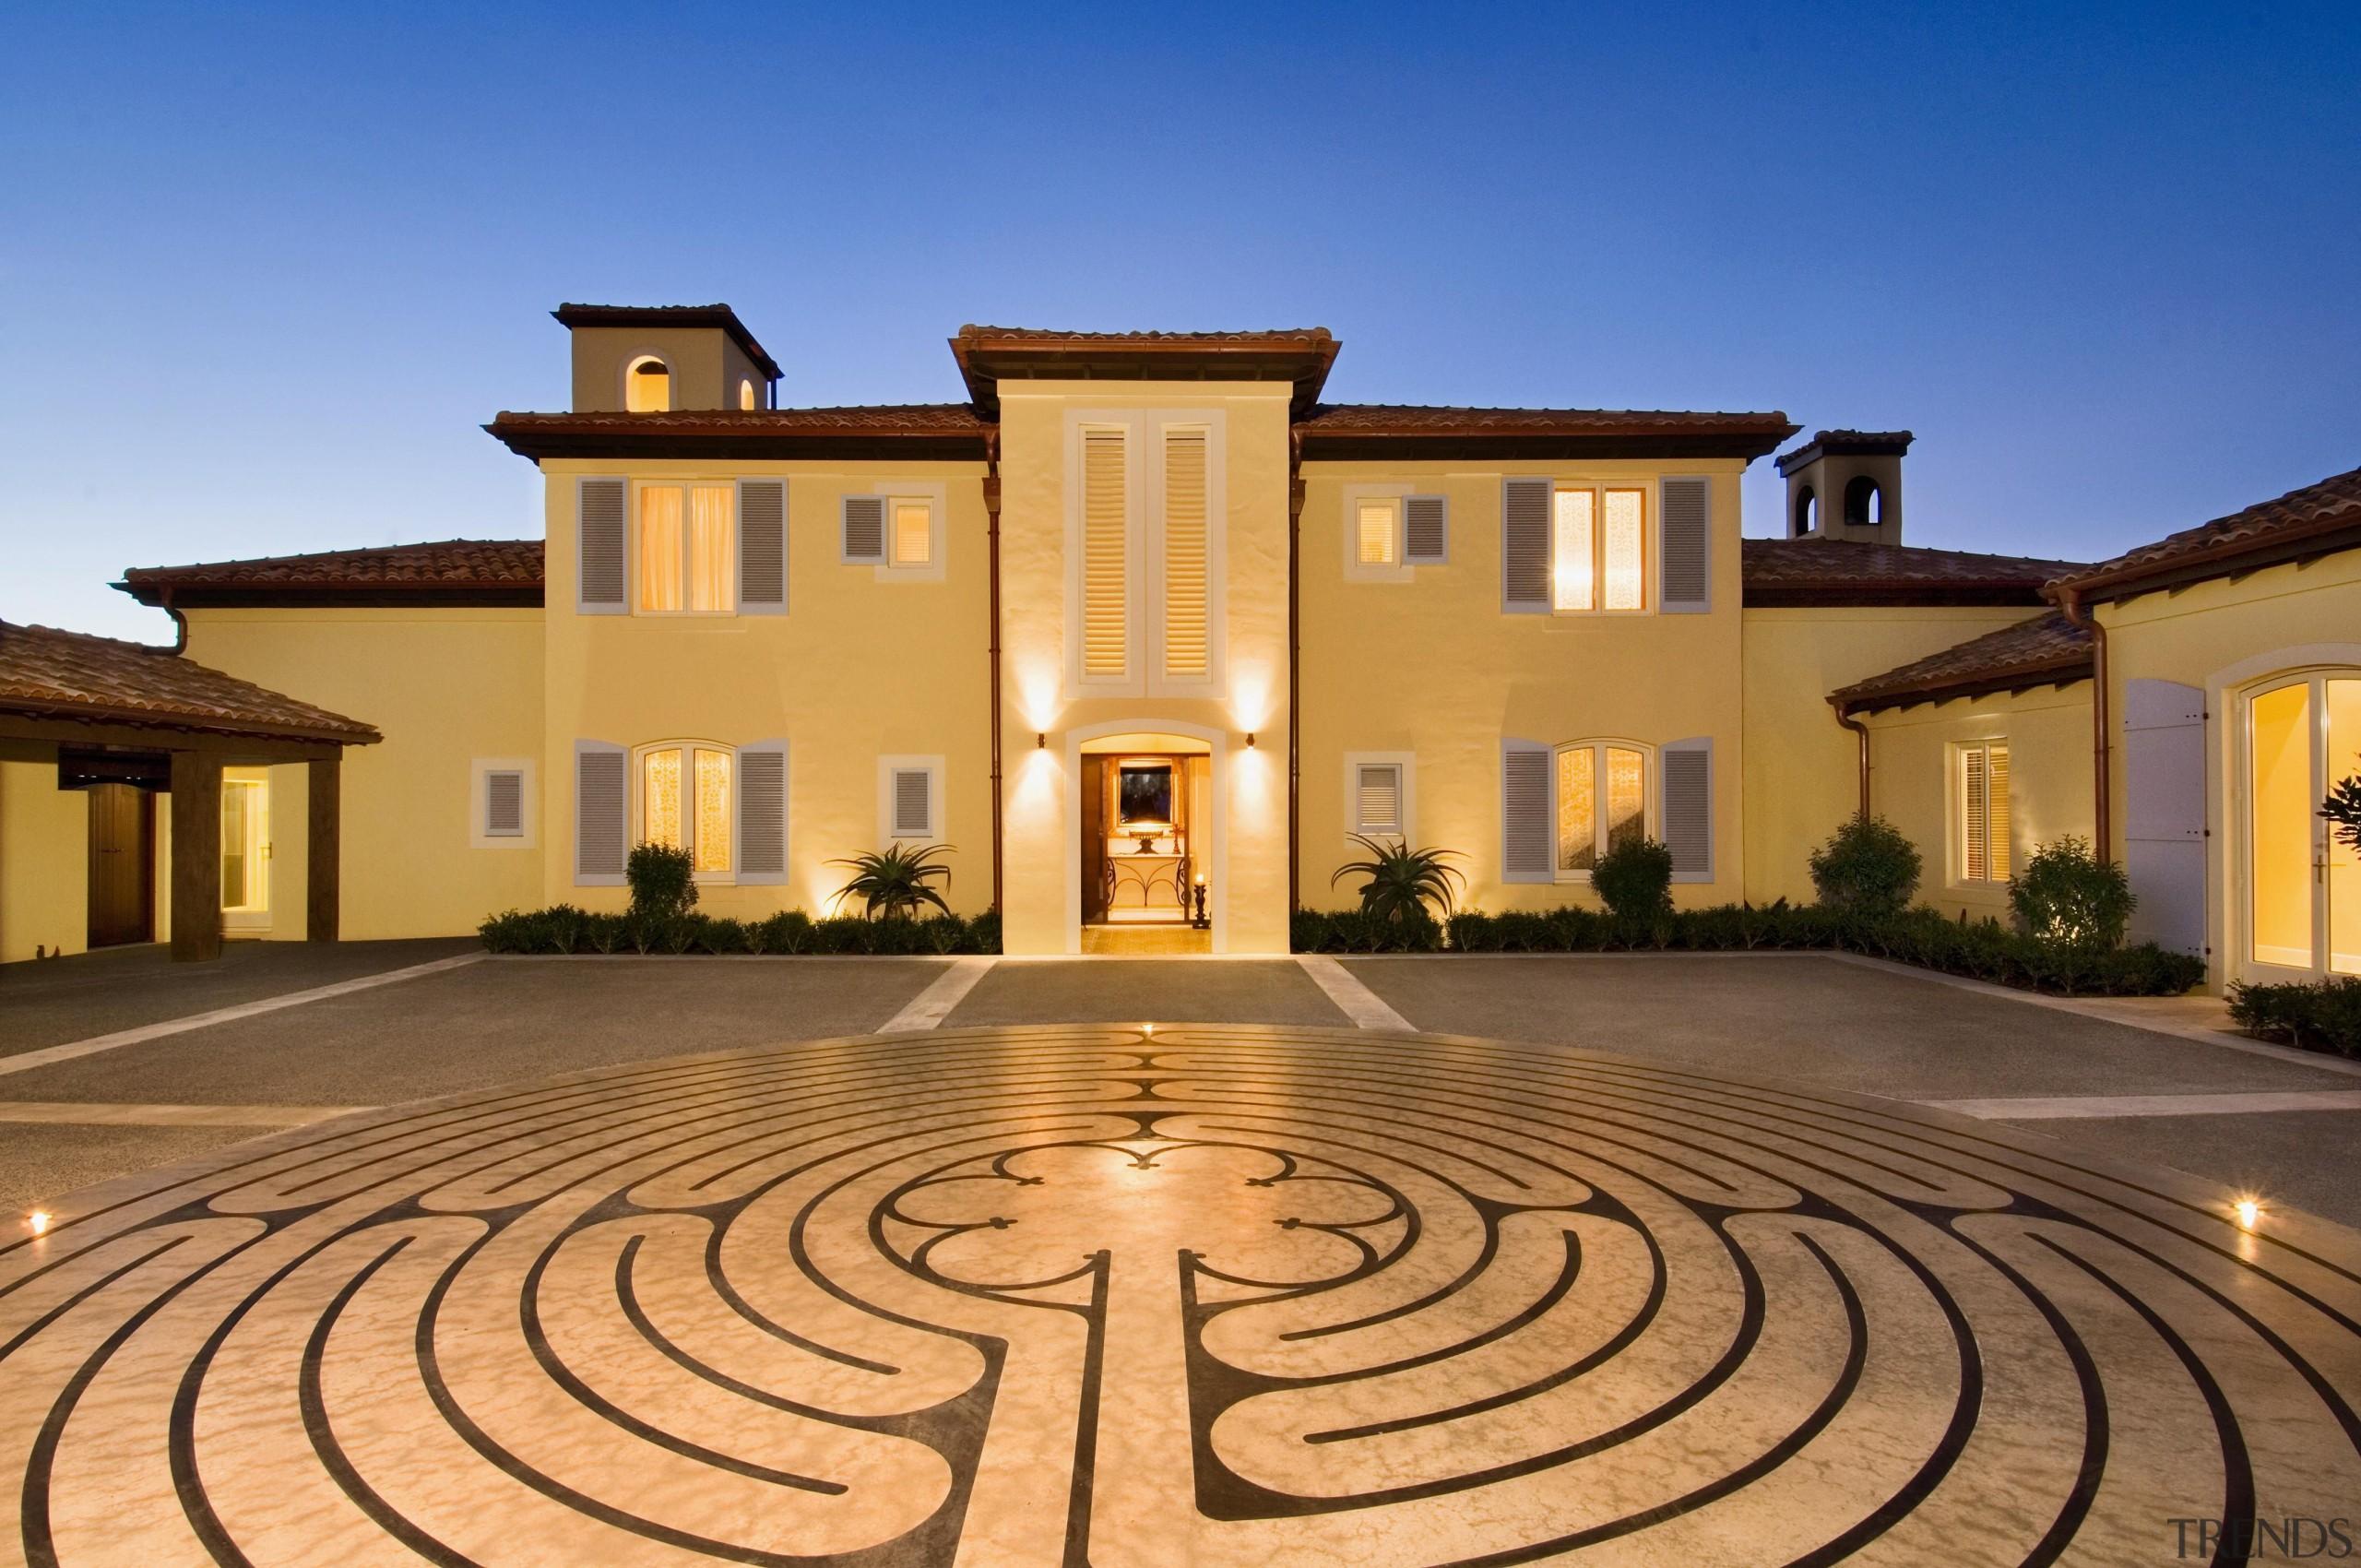 133 mahoenui 3 - Mahoenui 3 - building building, estate, facade, hacienda, home, house, lighting, mansion, property, real estate, villa, brown, orange, blue